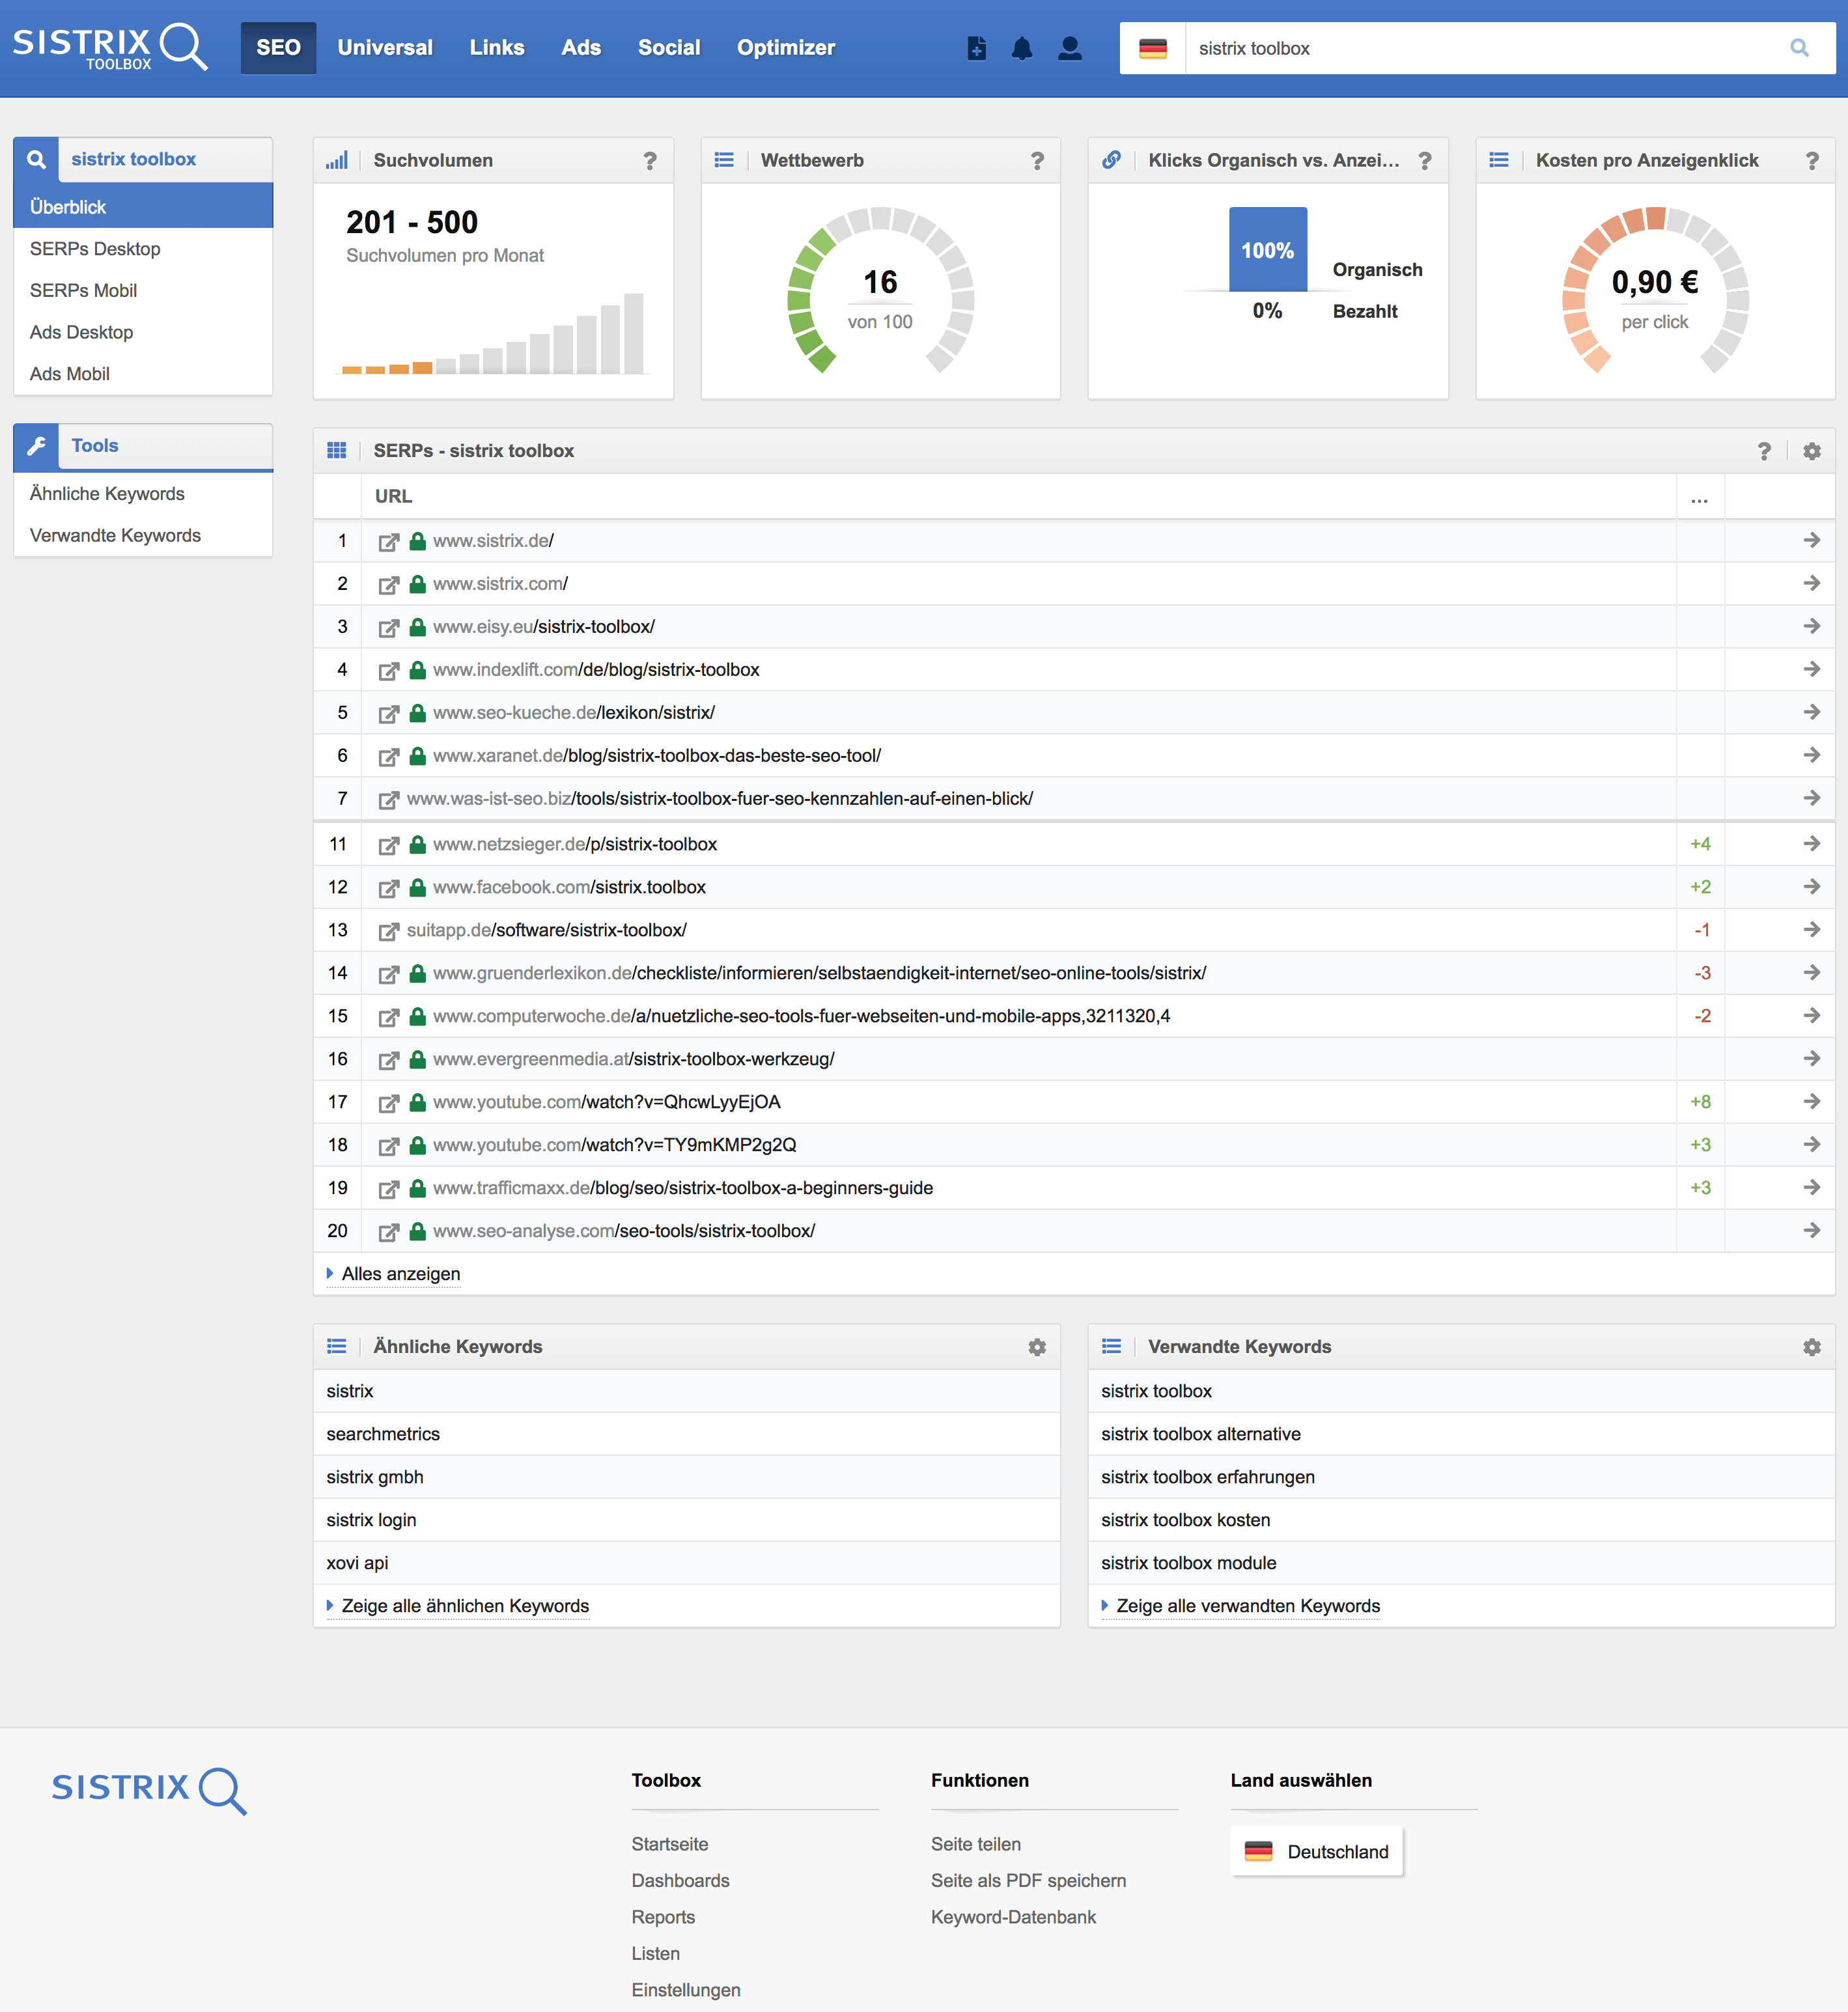 Beispiel des SERPS Overview // SISTRIX Toolbox